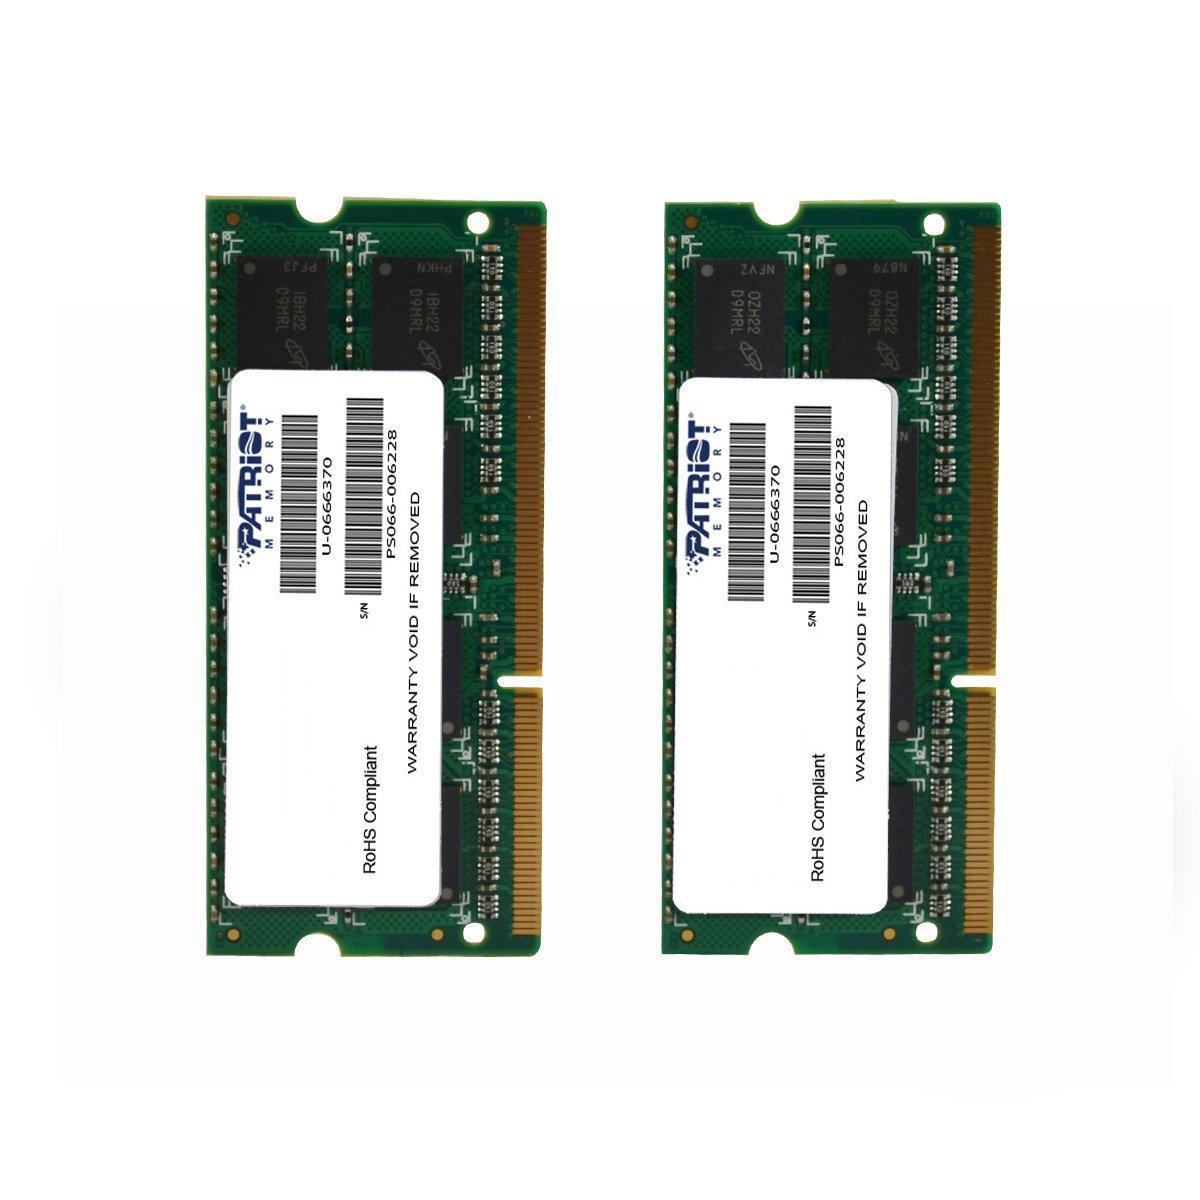 2 barrettes de ram Patriot PSA38G1333SK 8Go (2x 4GB) Signature Line 1333MHz SODIMM